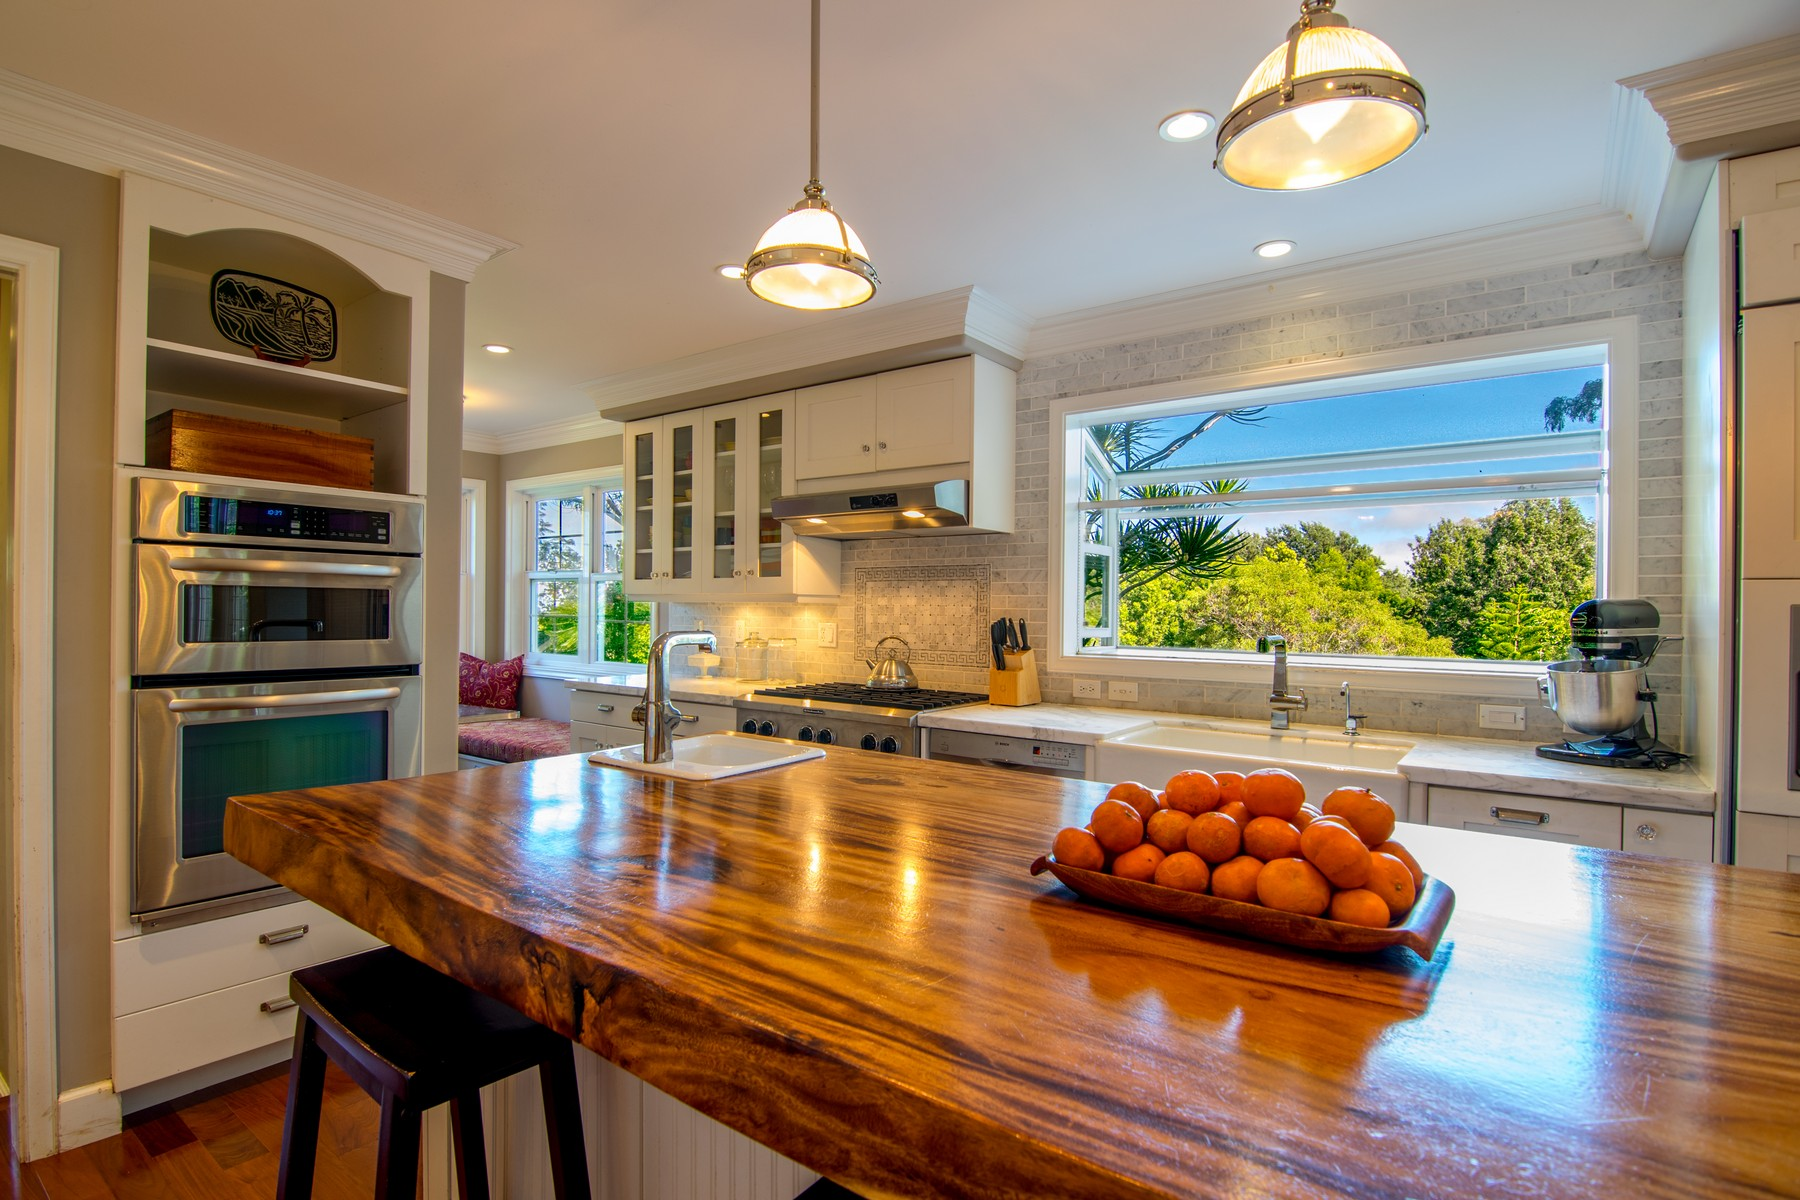 Single Family Home for Sale at Kula 200 - The Perfect Location 275 Hoopalua Drive Pukalani, Hawaii, 96768 United States